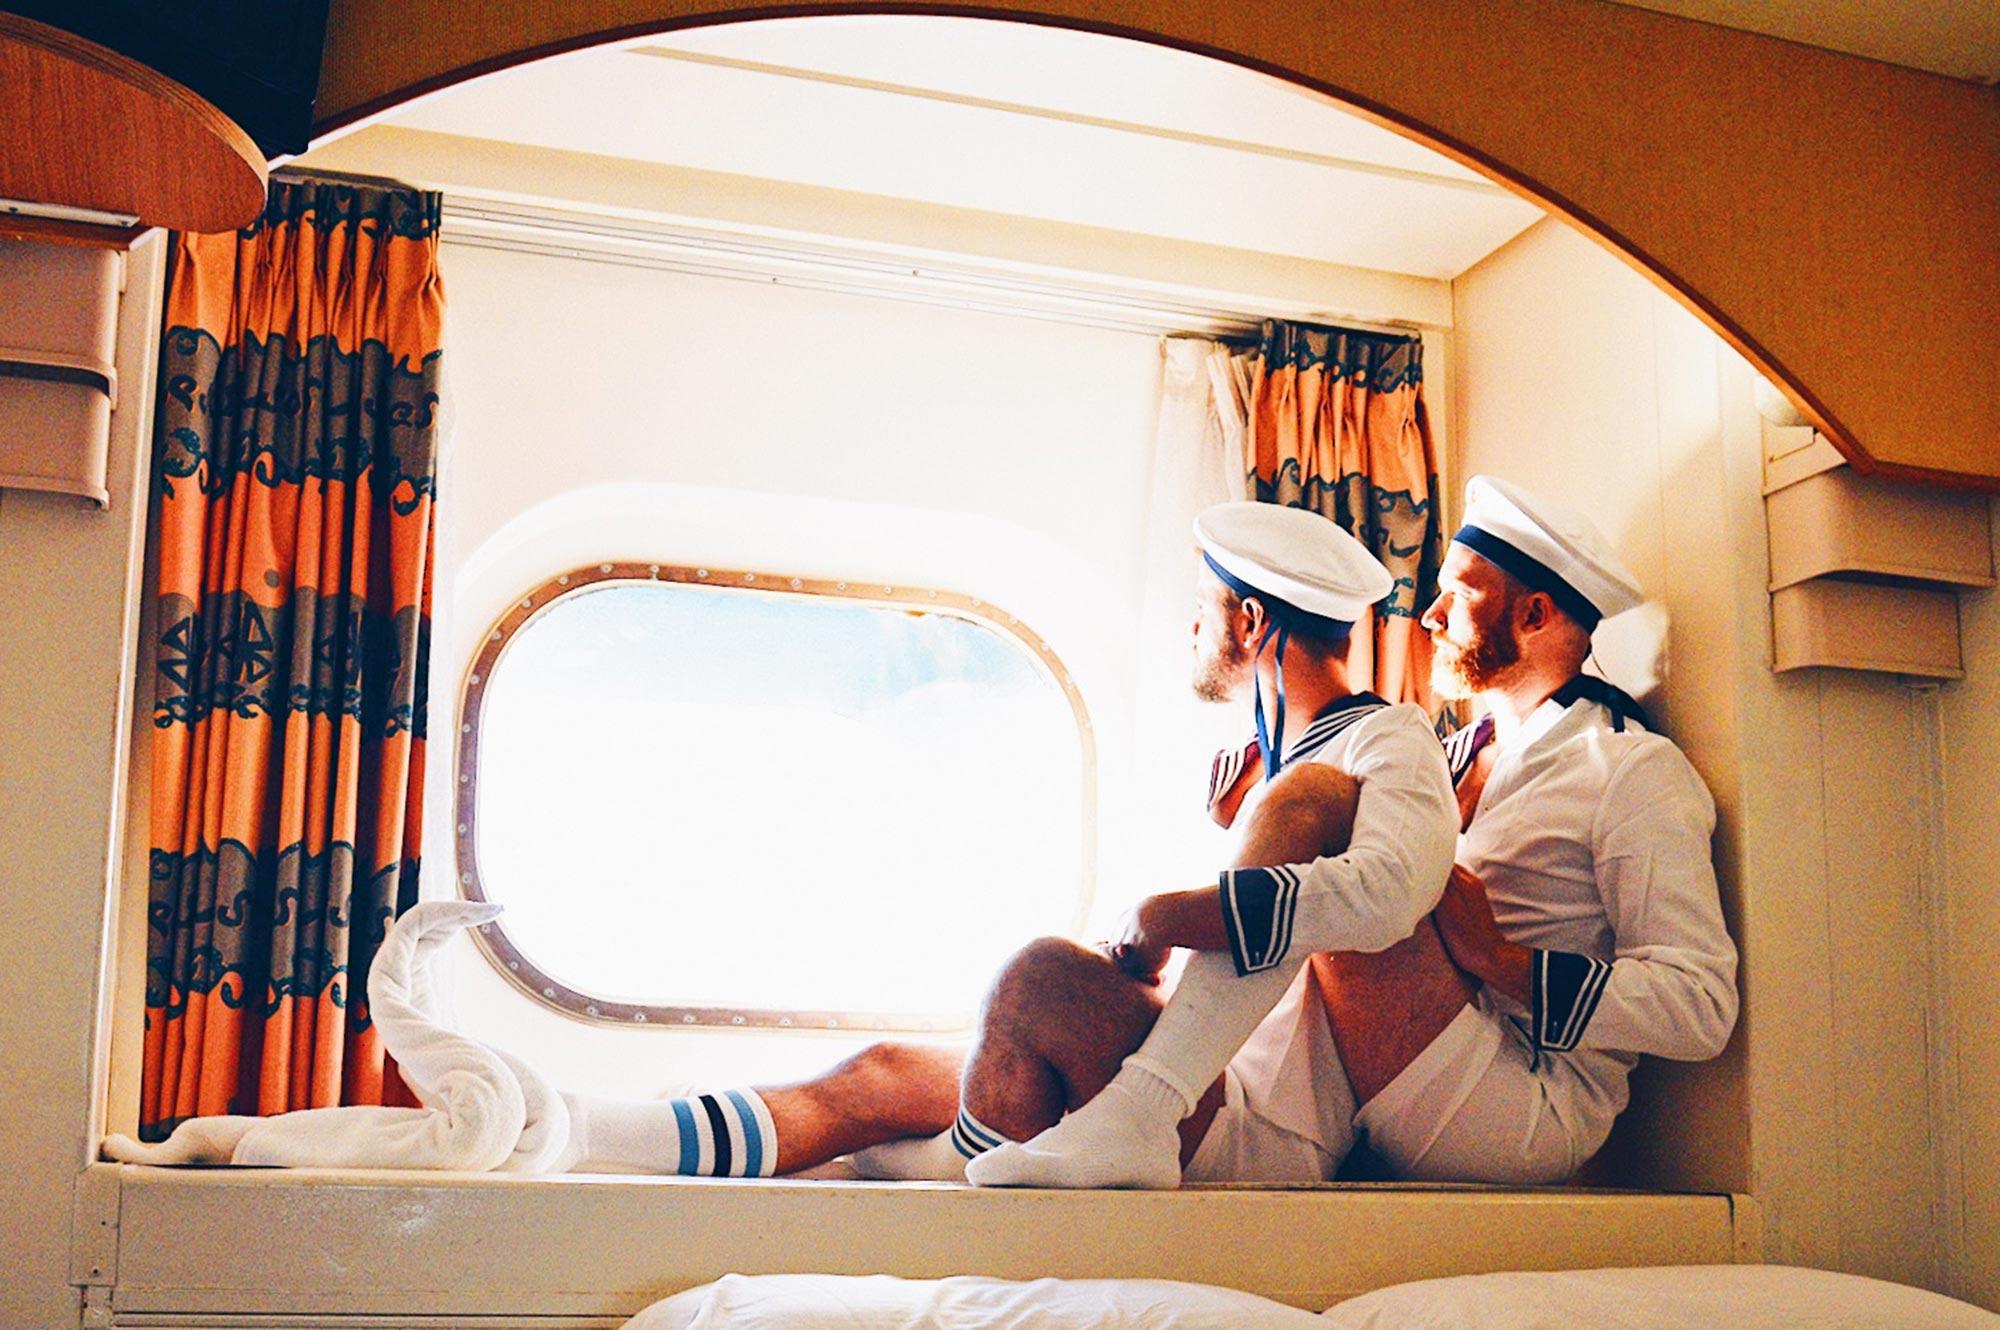 Tips European Gay Cruise Gay Couple Travel Blogger Karl & Daan Enjoying The Cruise view | Gay Men Tips La Demence The Cruise © CoupleofMen.com